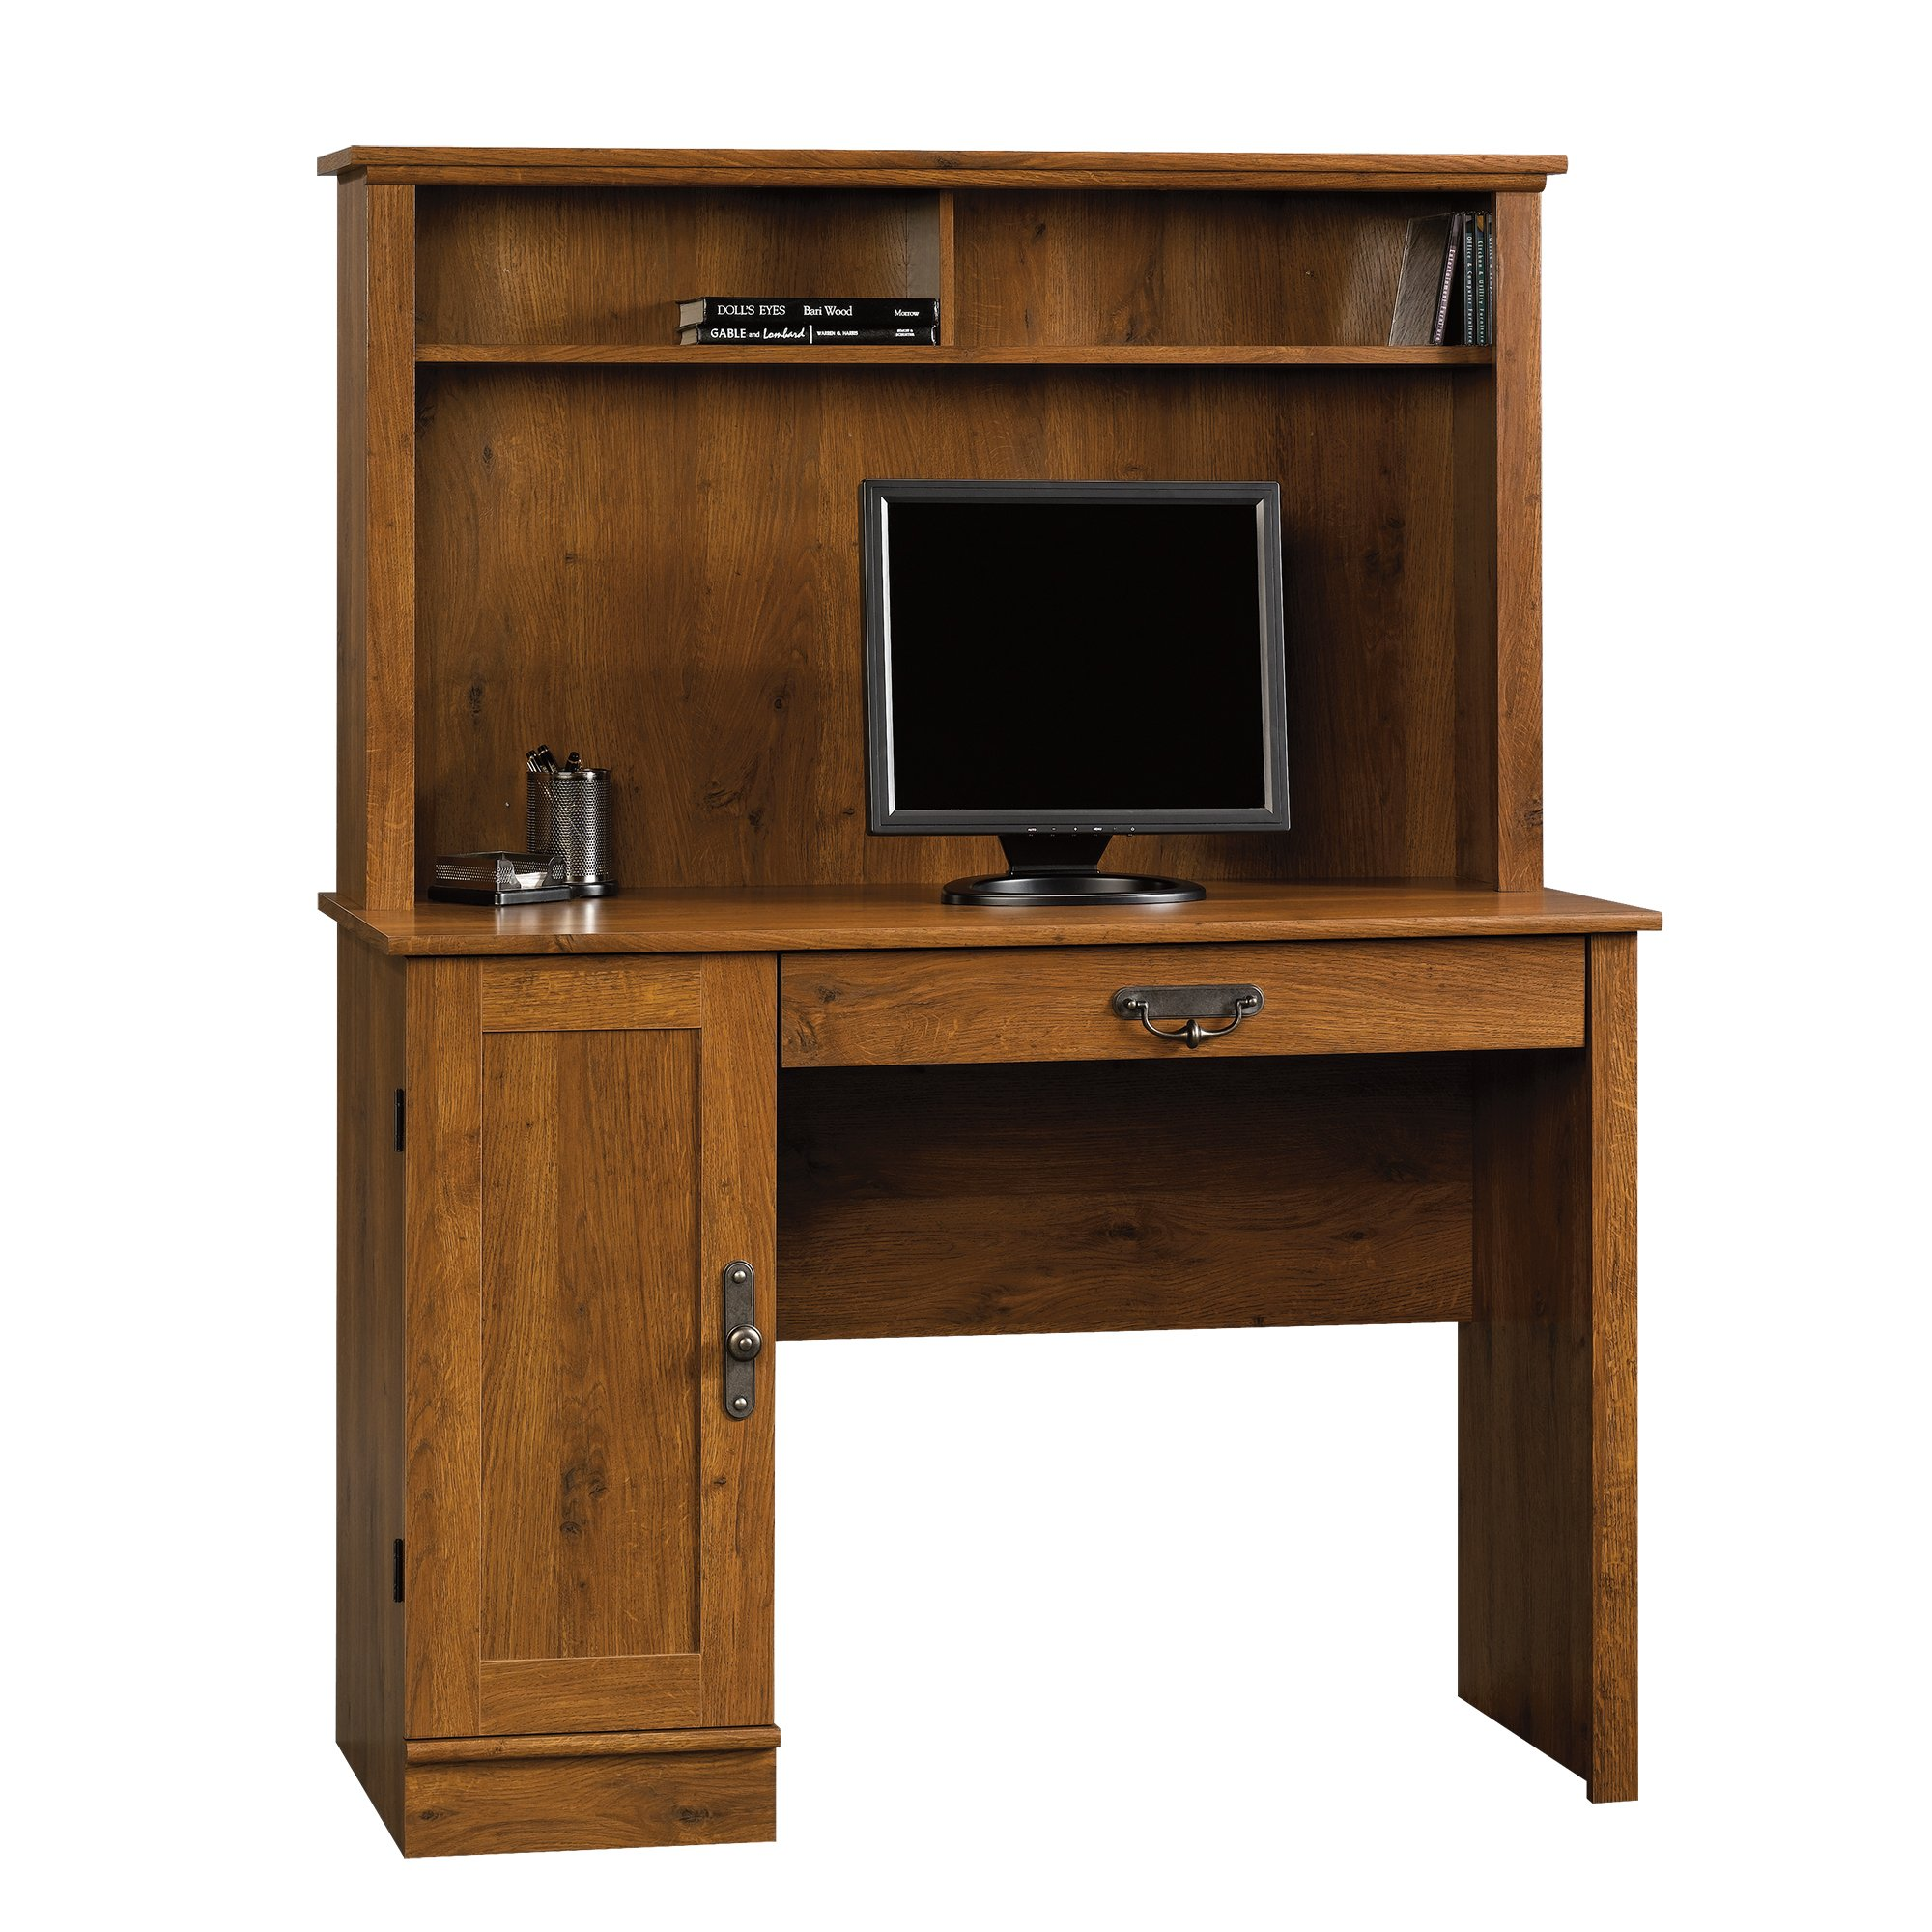 Sauder 404961 Harvest Mill Computer Desk with Hutch, L: 43.47'' x W: 19.45'' x H: 56.30'', Abbey Oak finish by Sauder